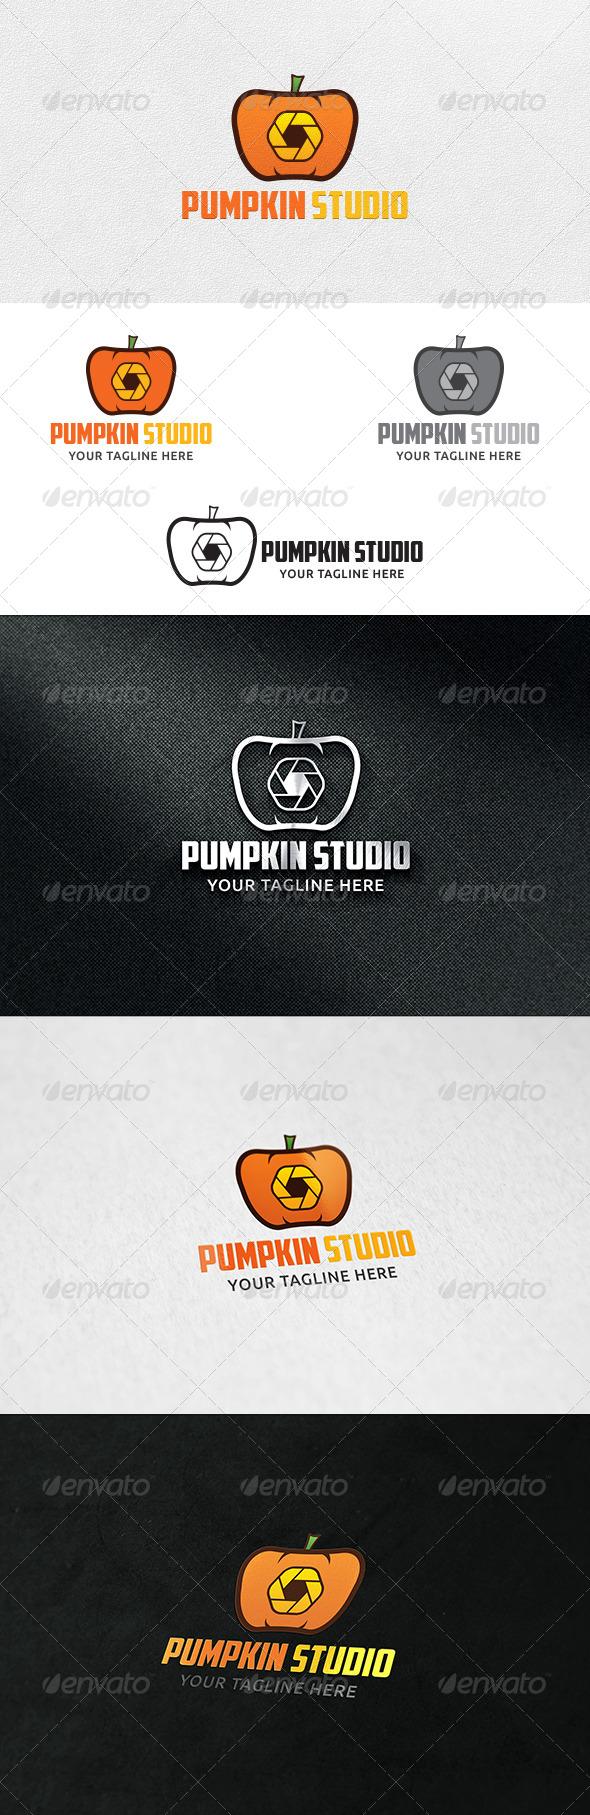 Pumpkin Studio - Logo Template - Symbols Logo Templates